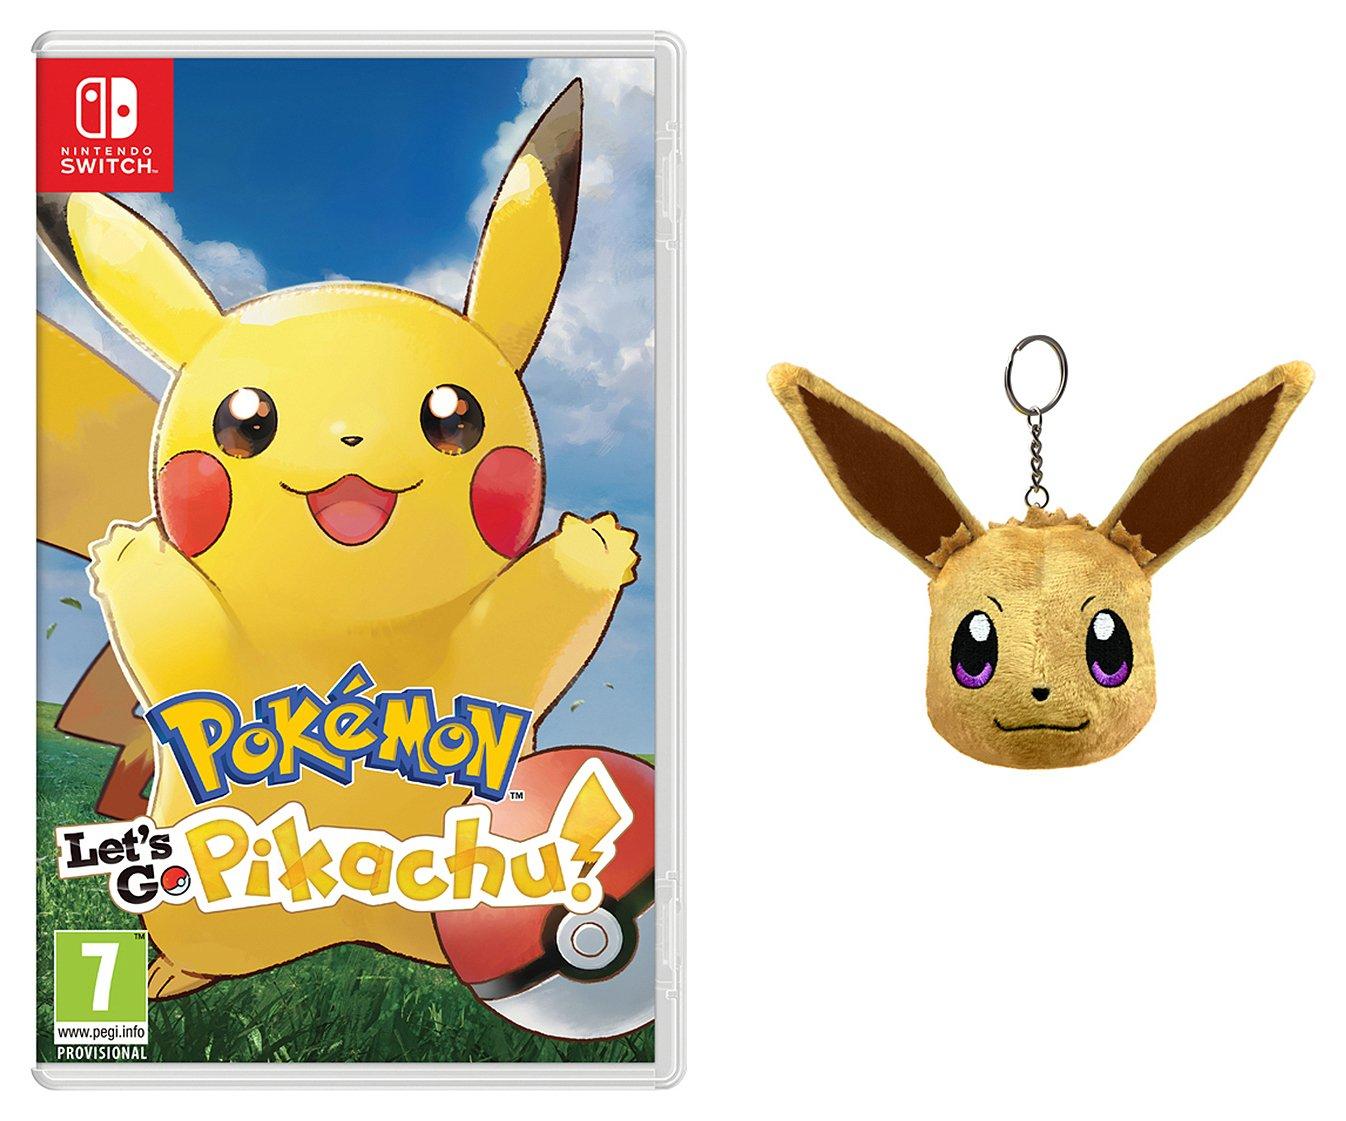 Pokemon Let's Go Pikachu Nintendo Switch Pre-Order Game